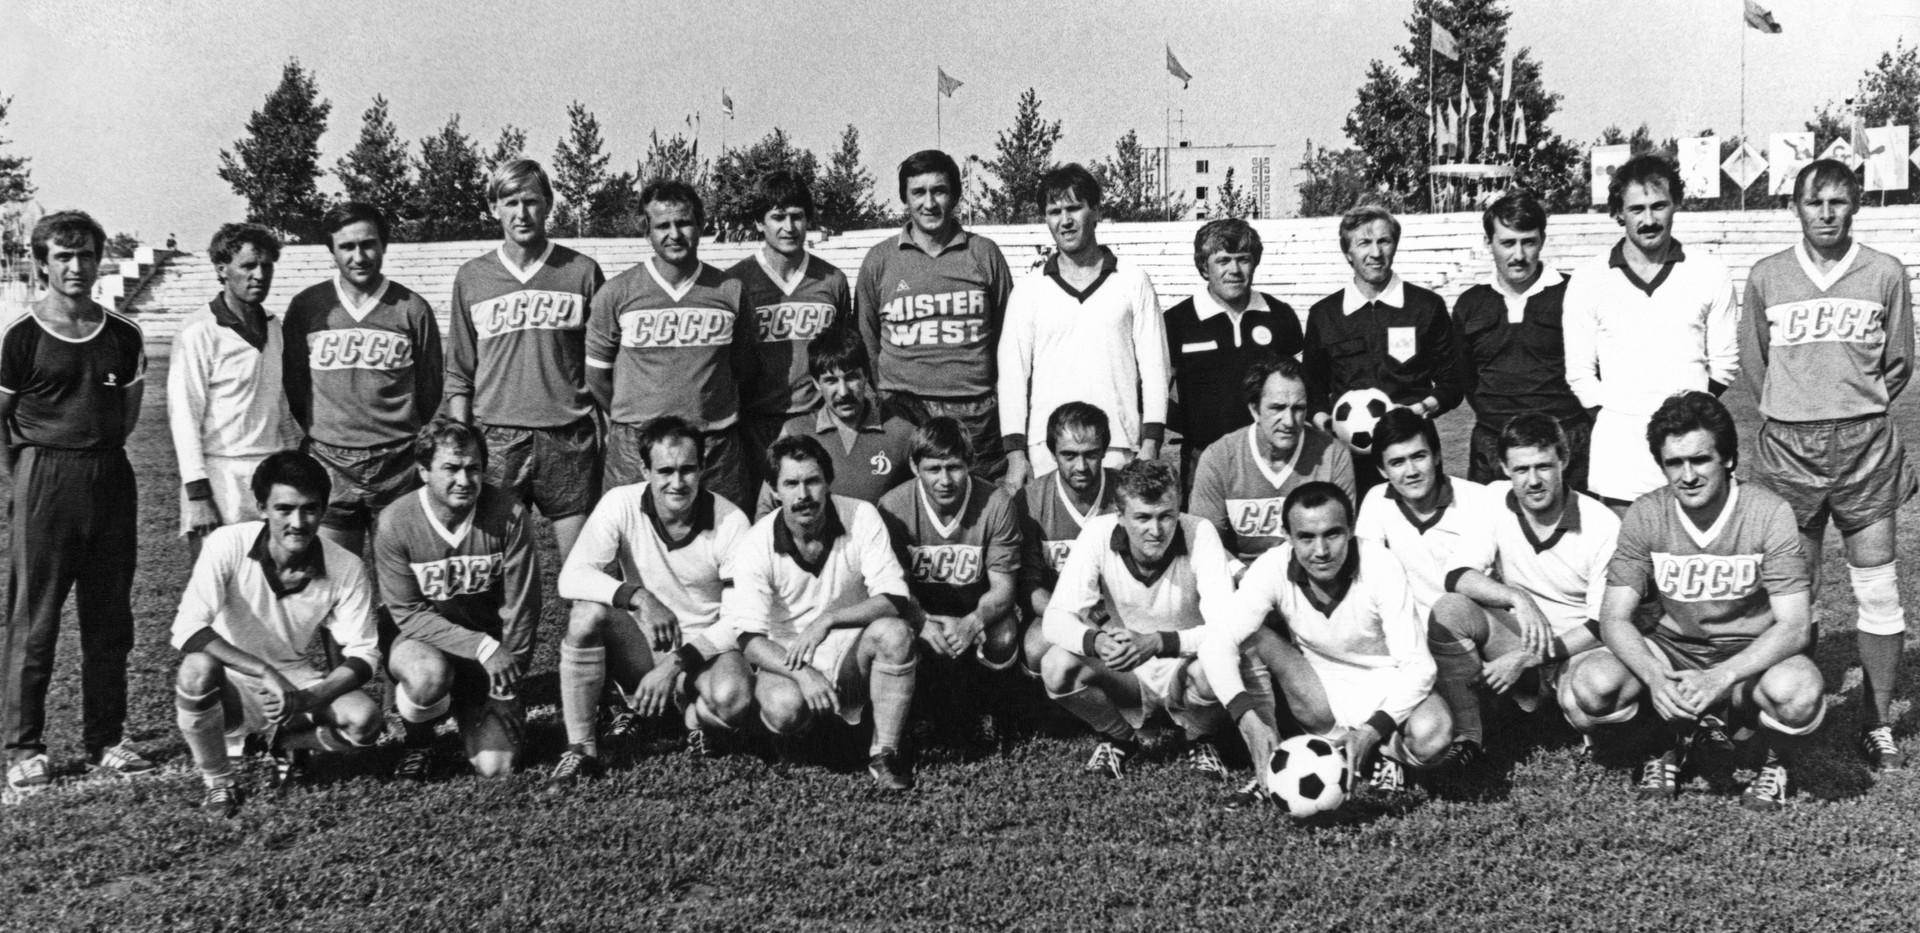 USSR-Mirzoyan-8.jpg